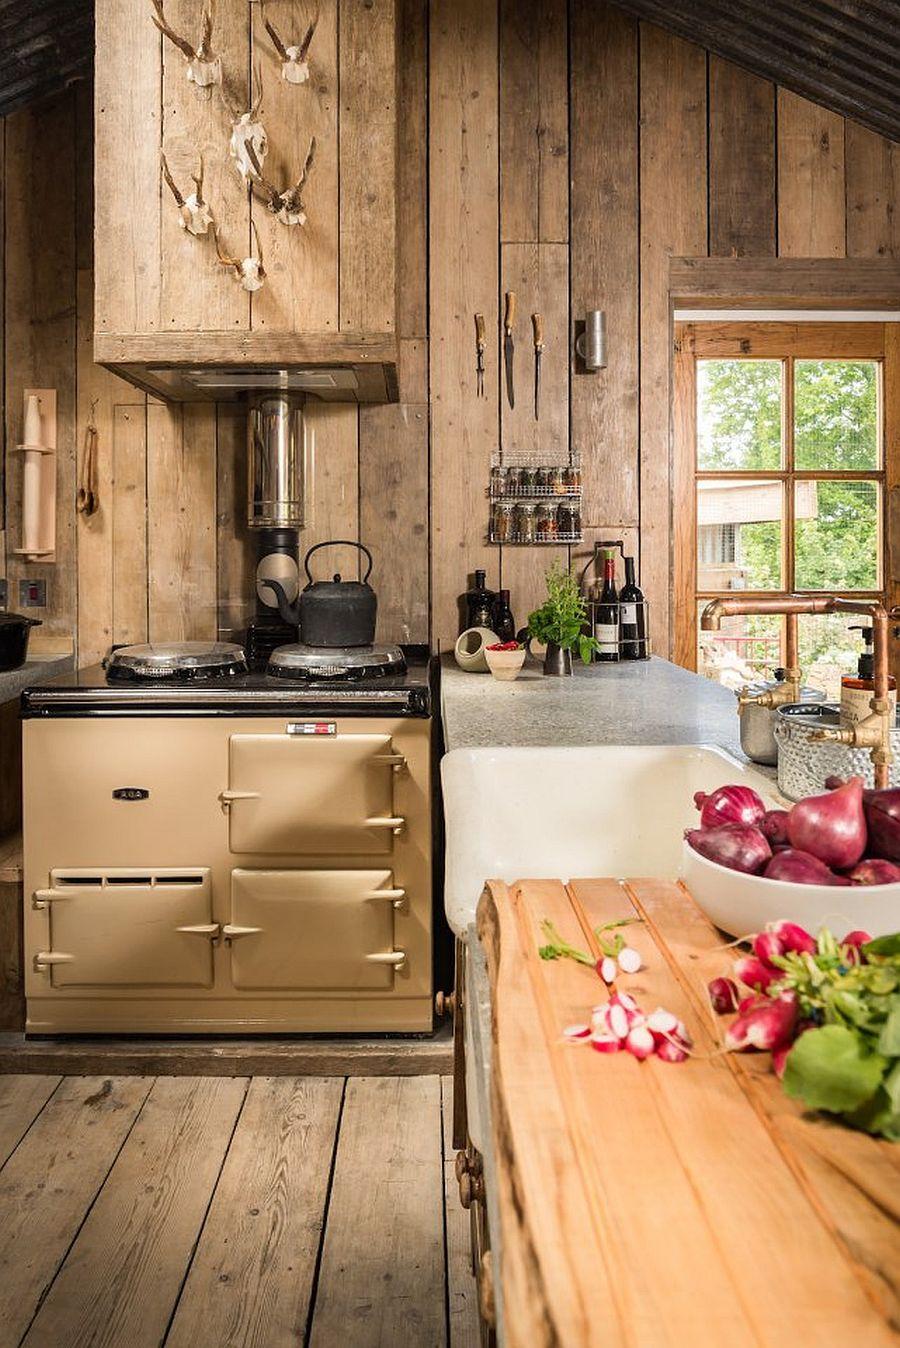 adelaparvu.com despre cabana rustica si tuse industriale, Firefly Cabin, Cornwall, Anglia, Foto Unique Home Stays (18)